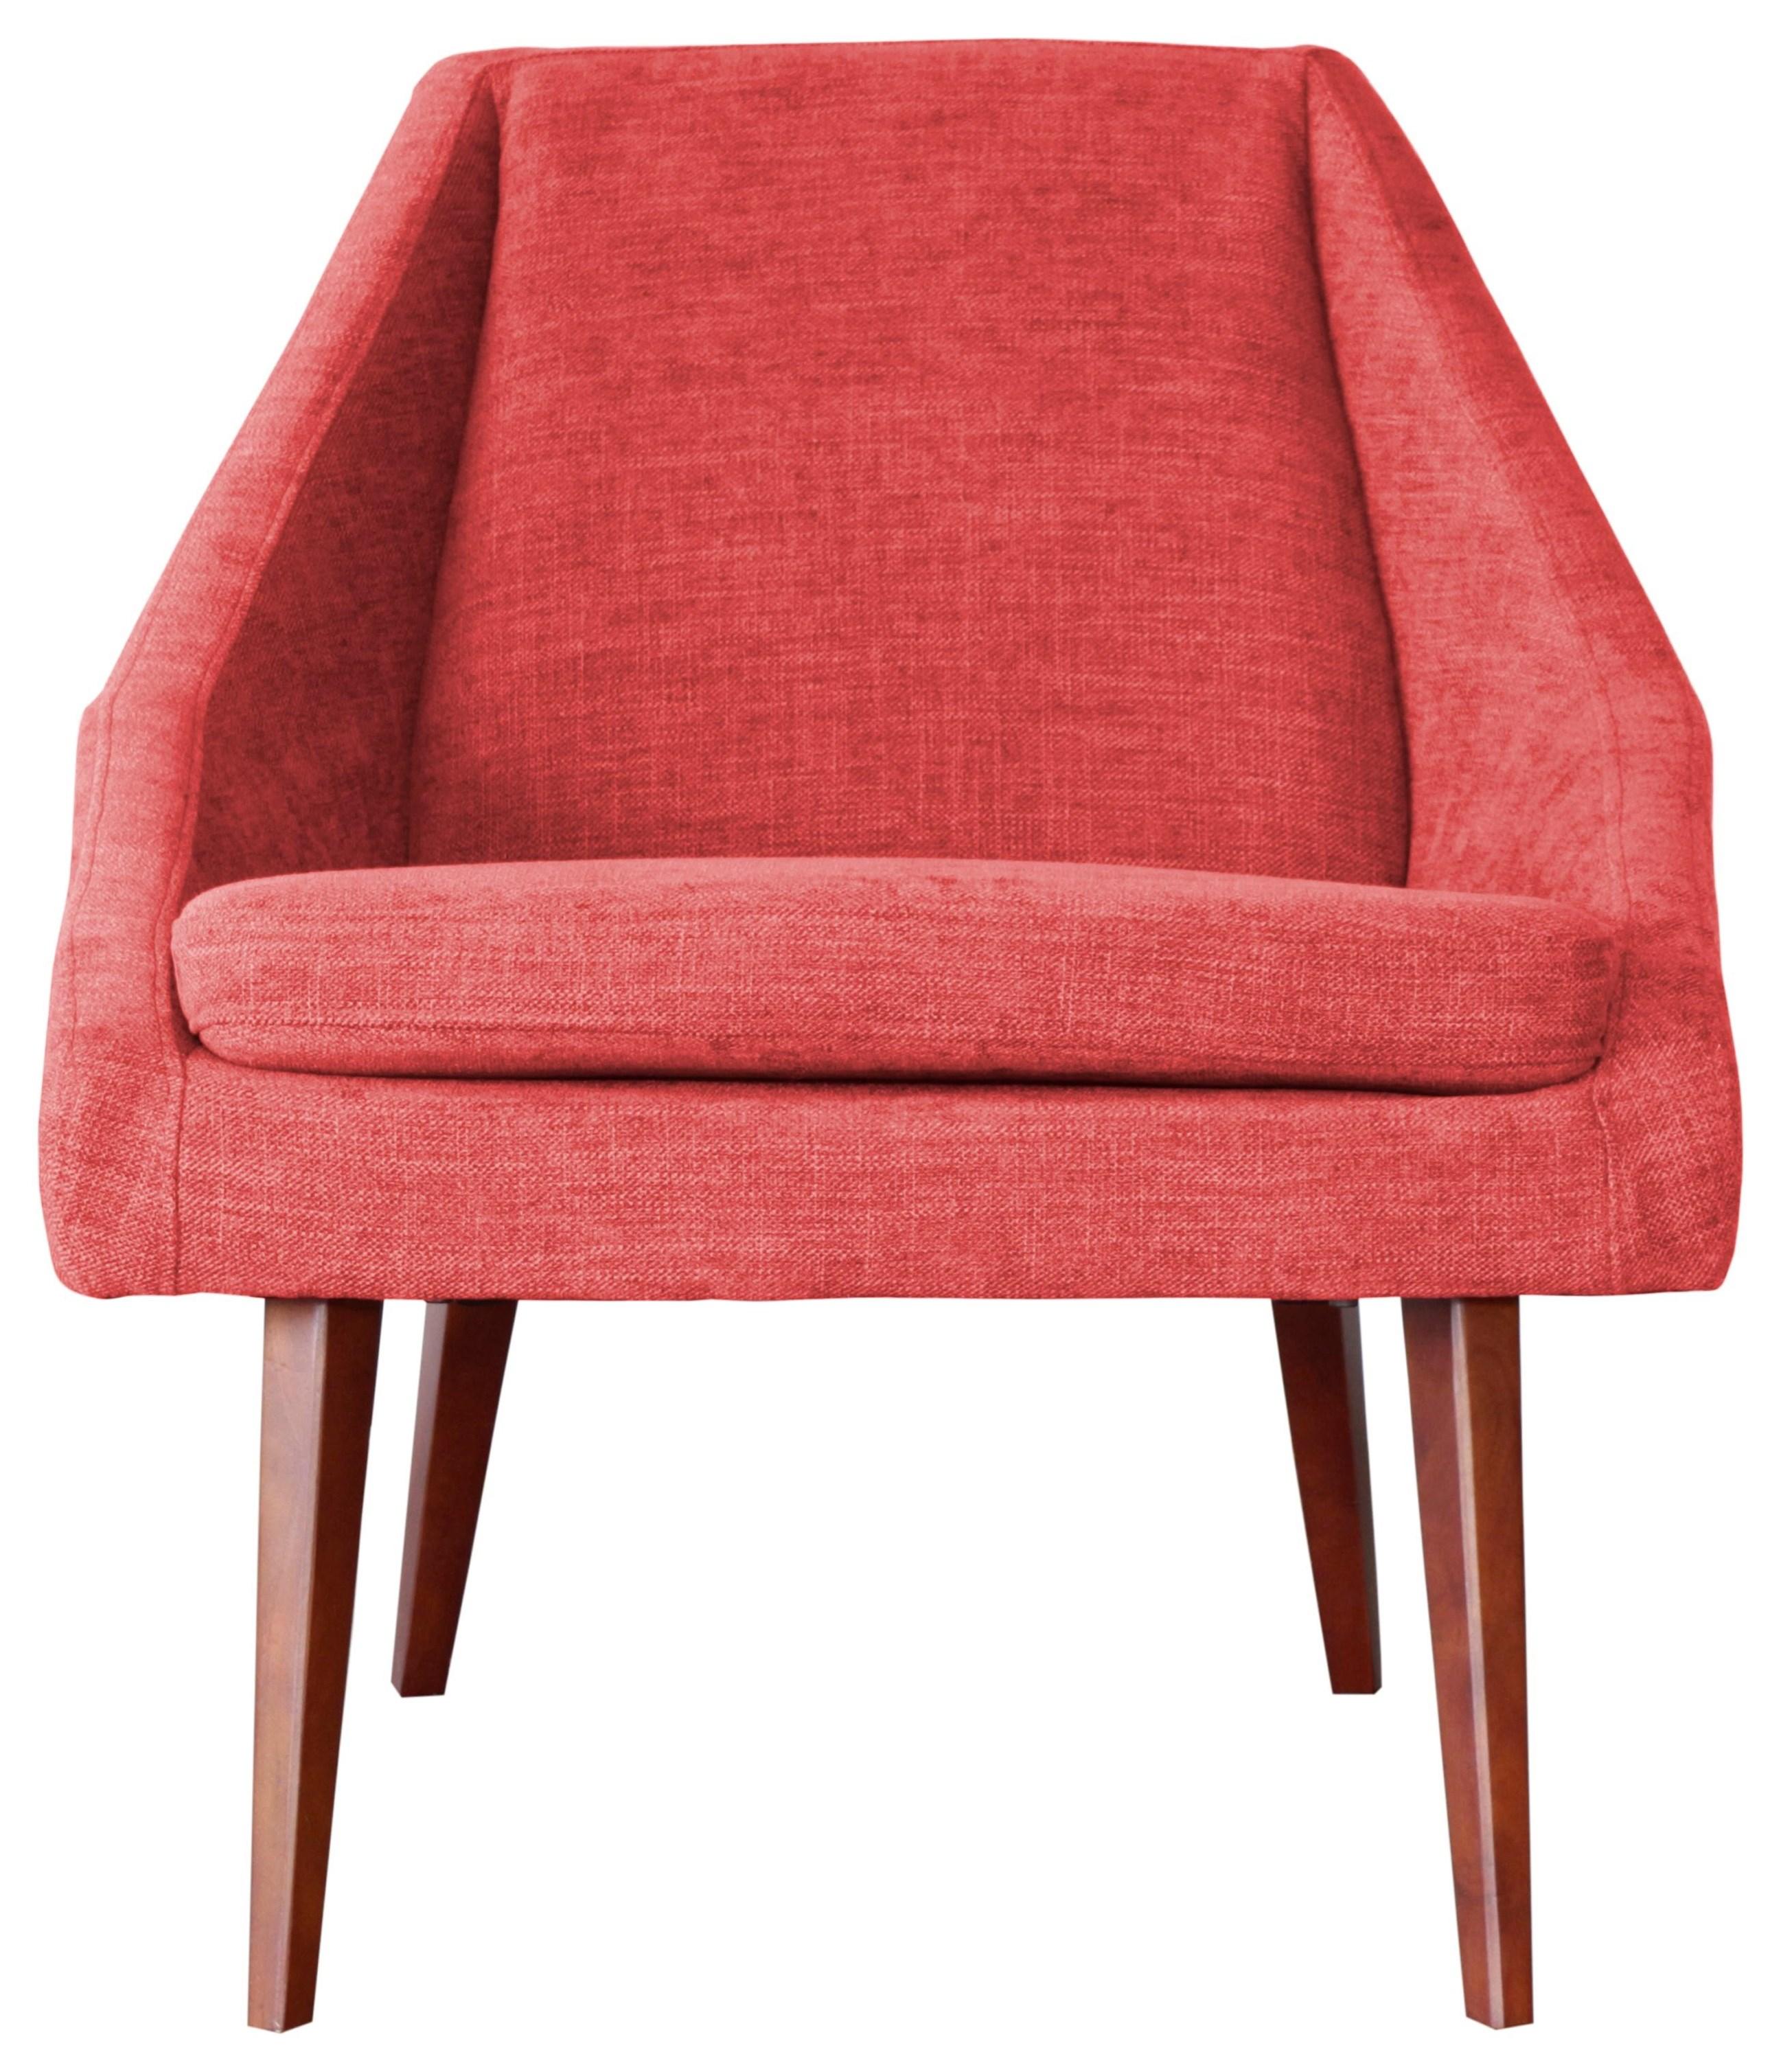 Lark Chair by Urban Chic at HomeWorld Furniture